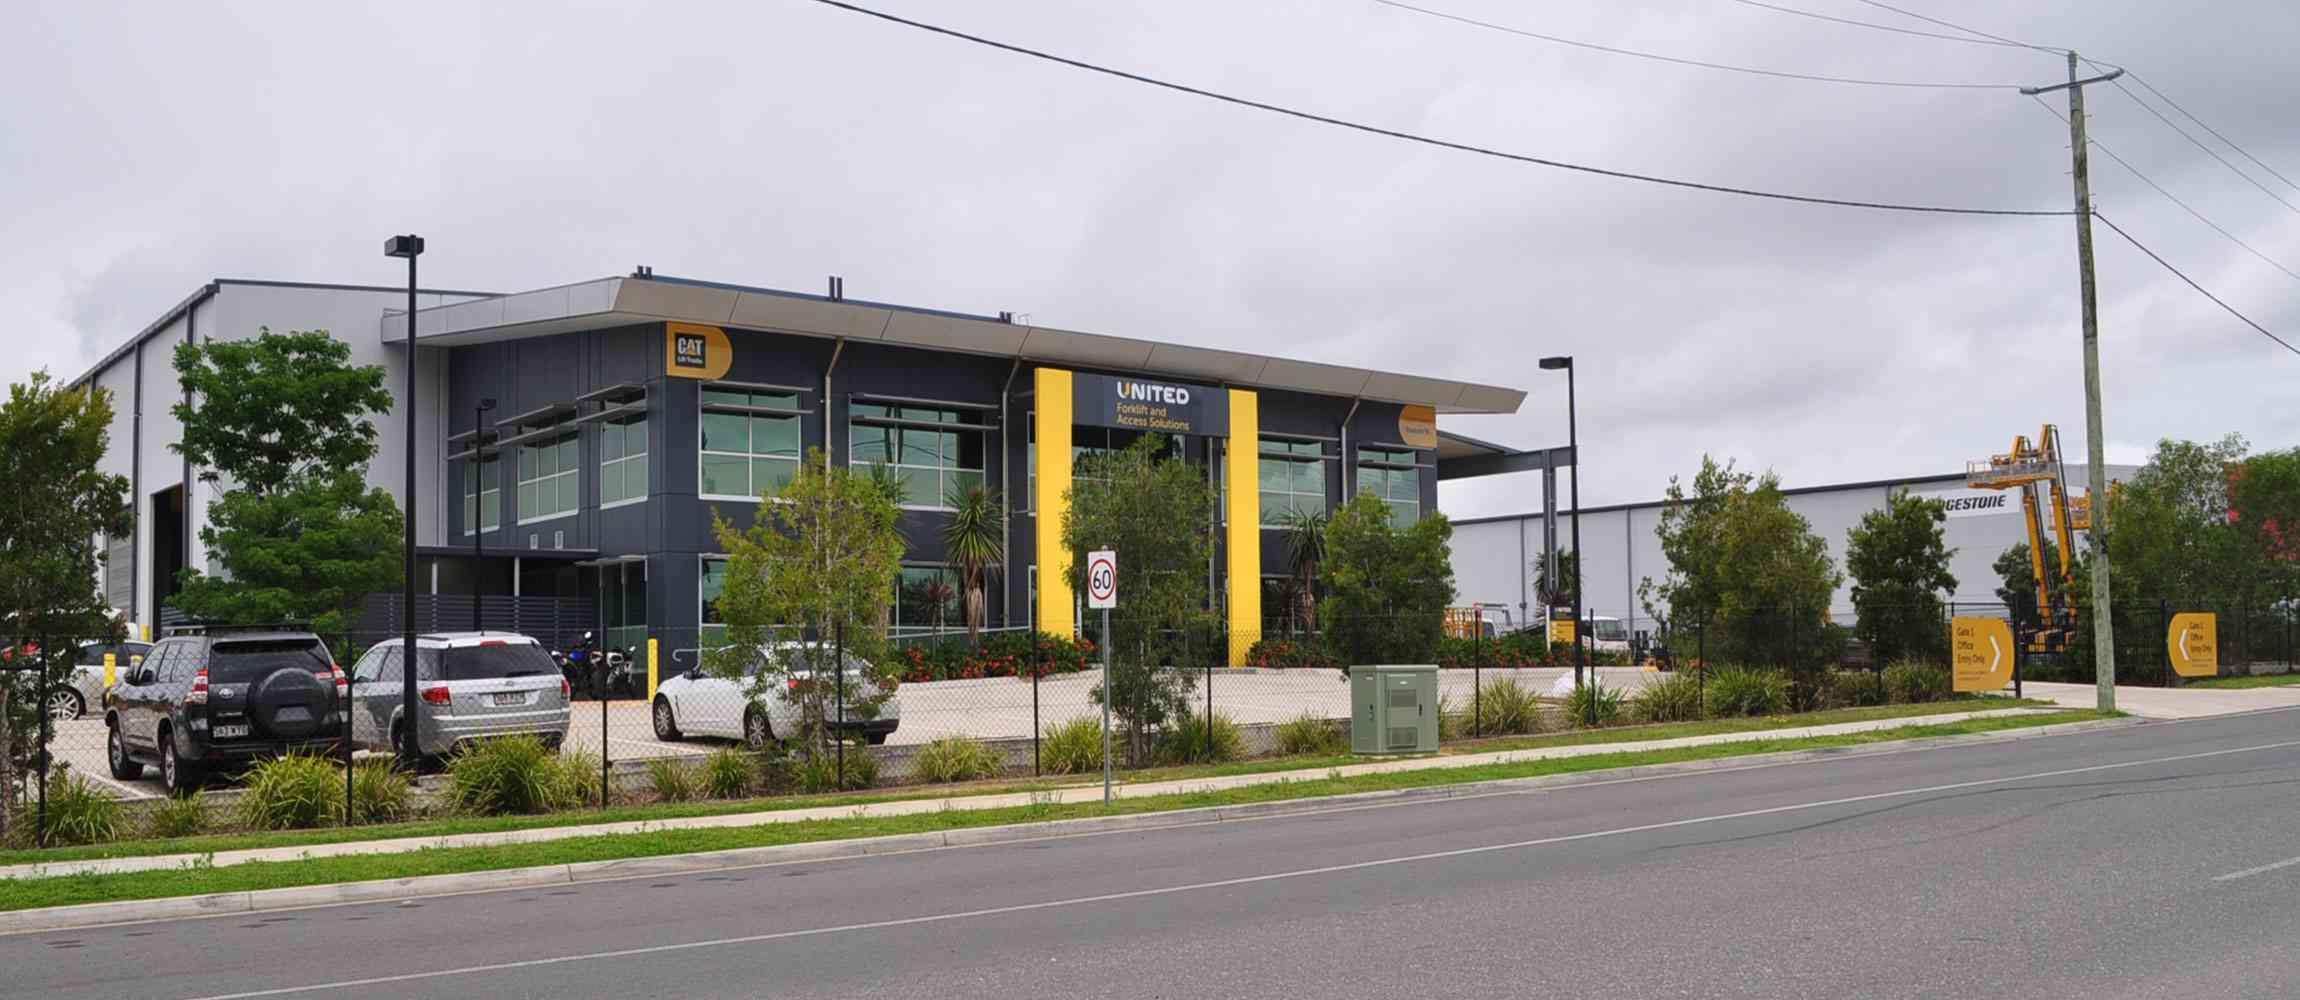 United Brisbane branch in the suburb of Eagle Farm